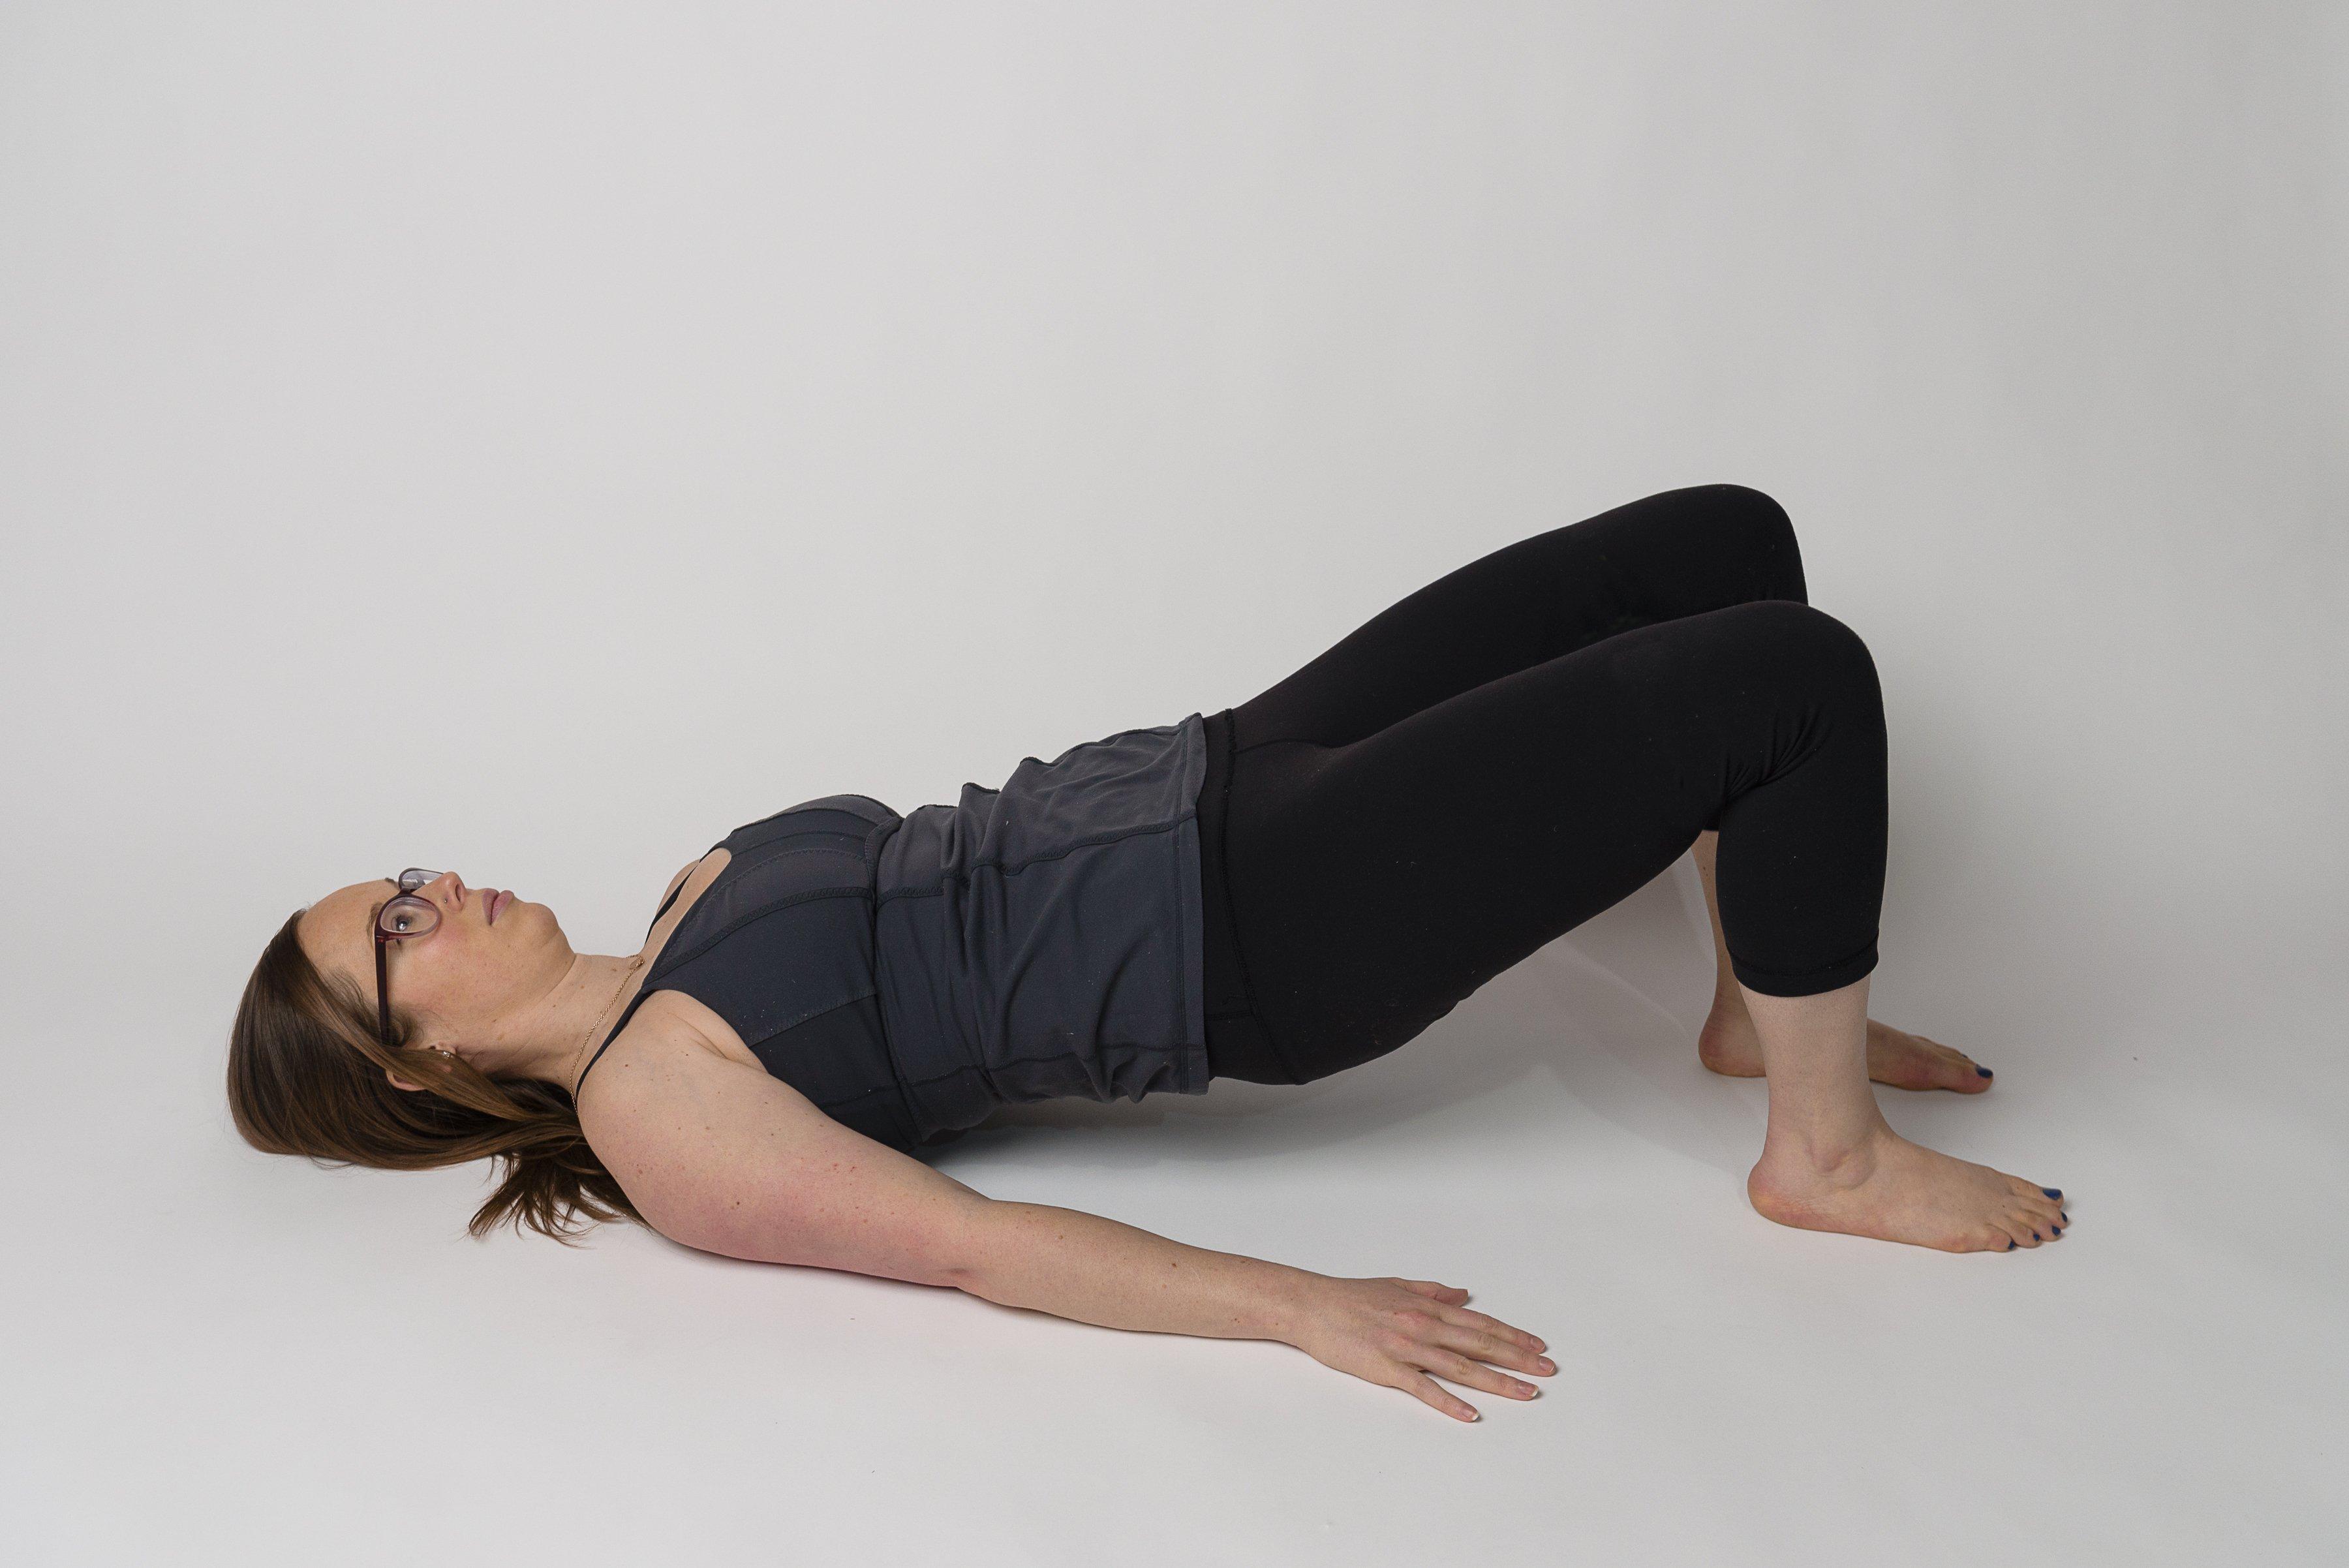 Core Exercises For Postpartum Jessie Mundell